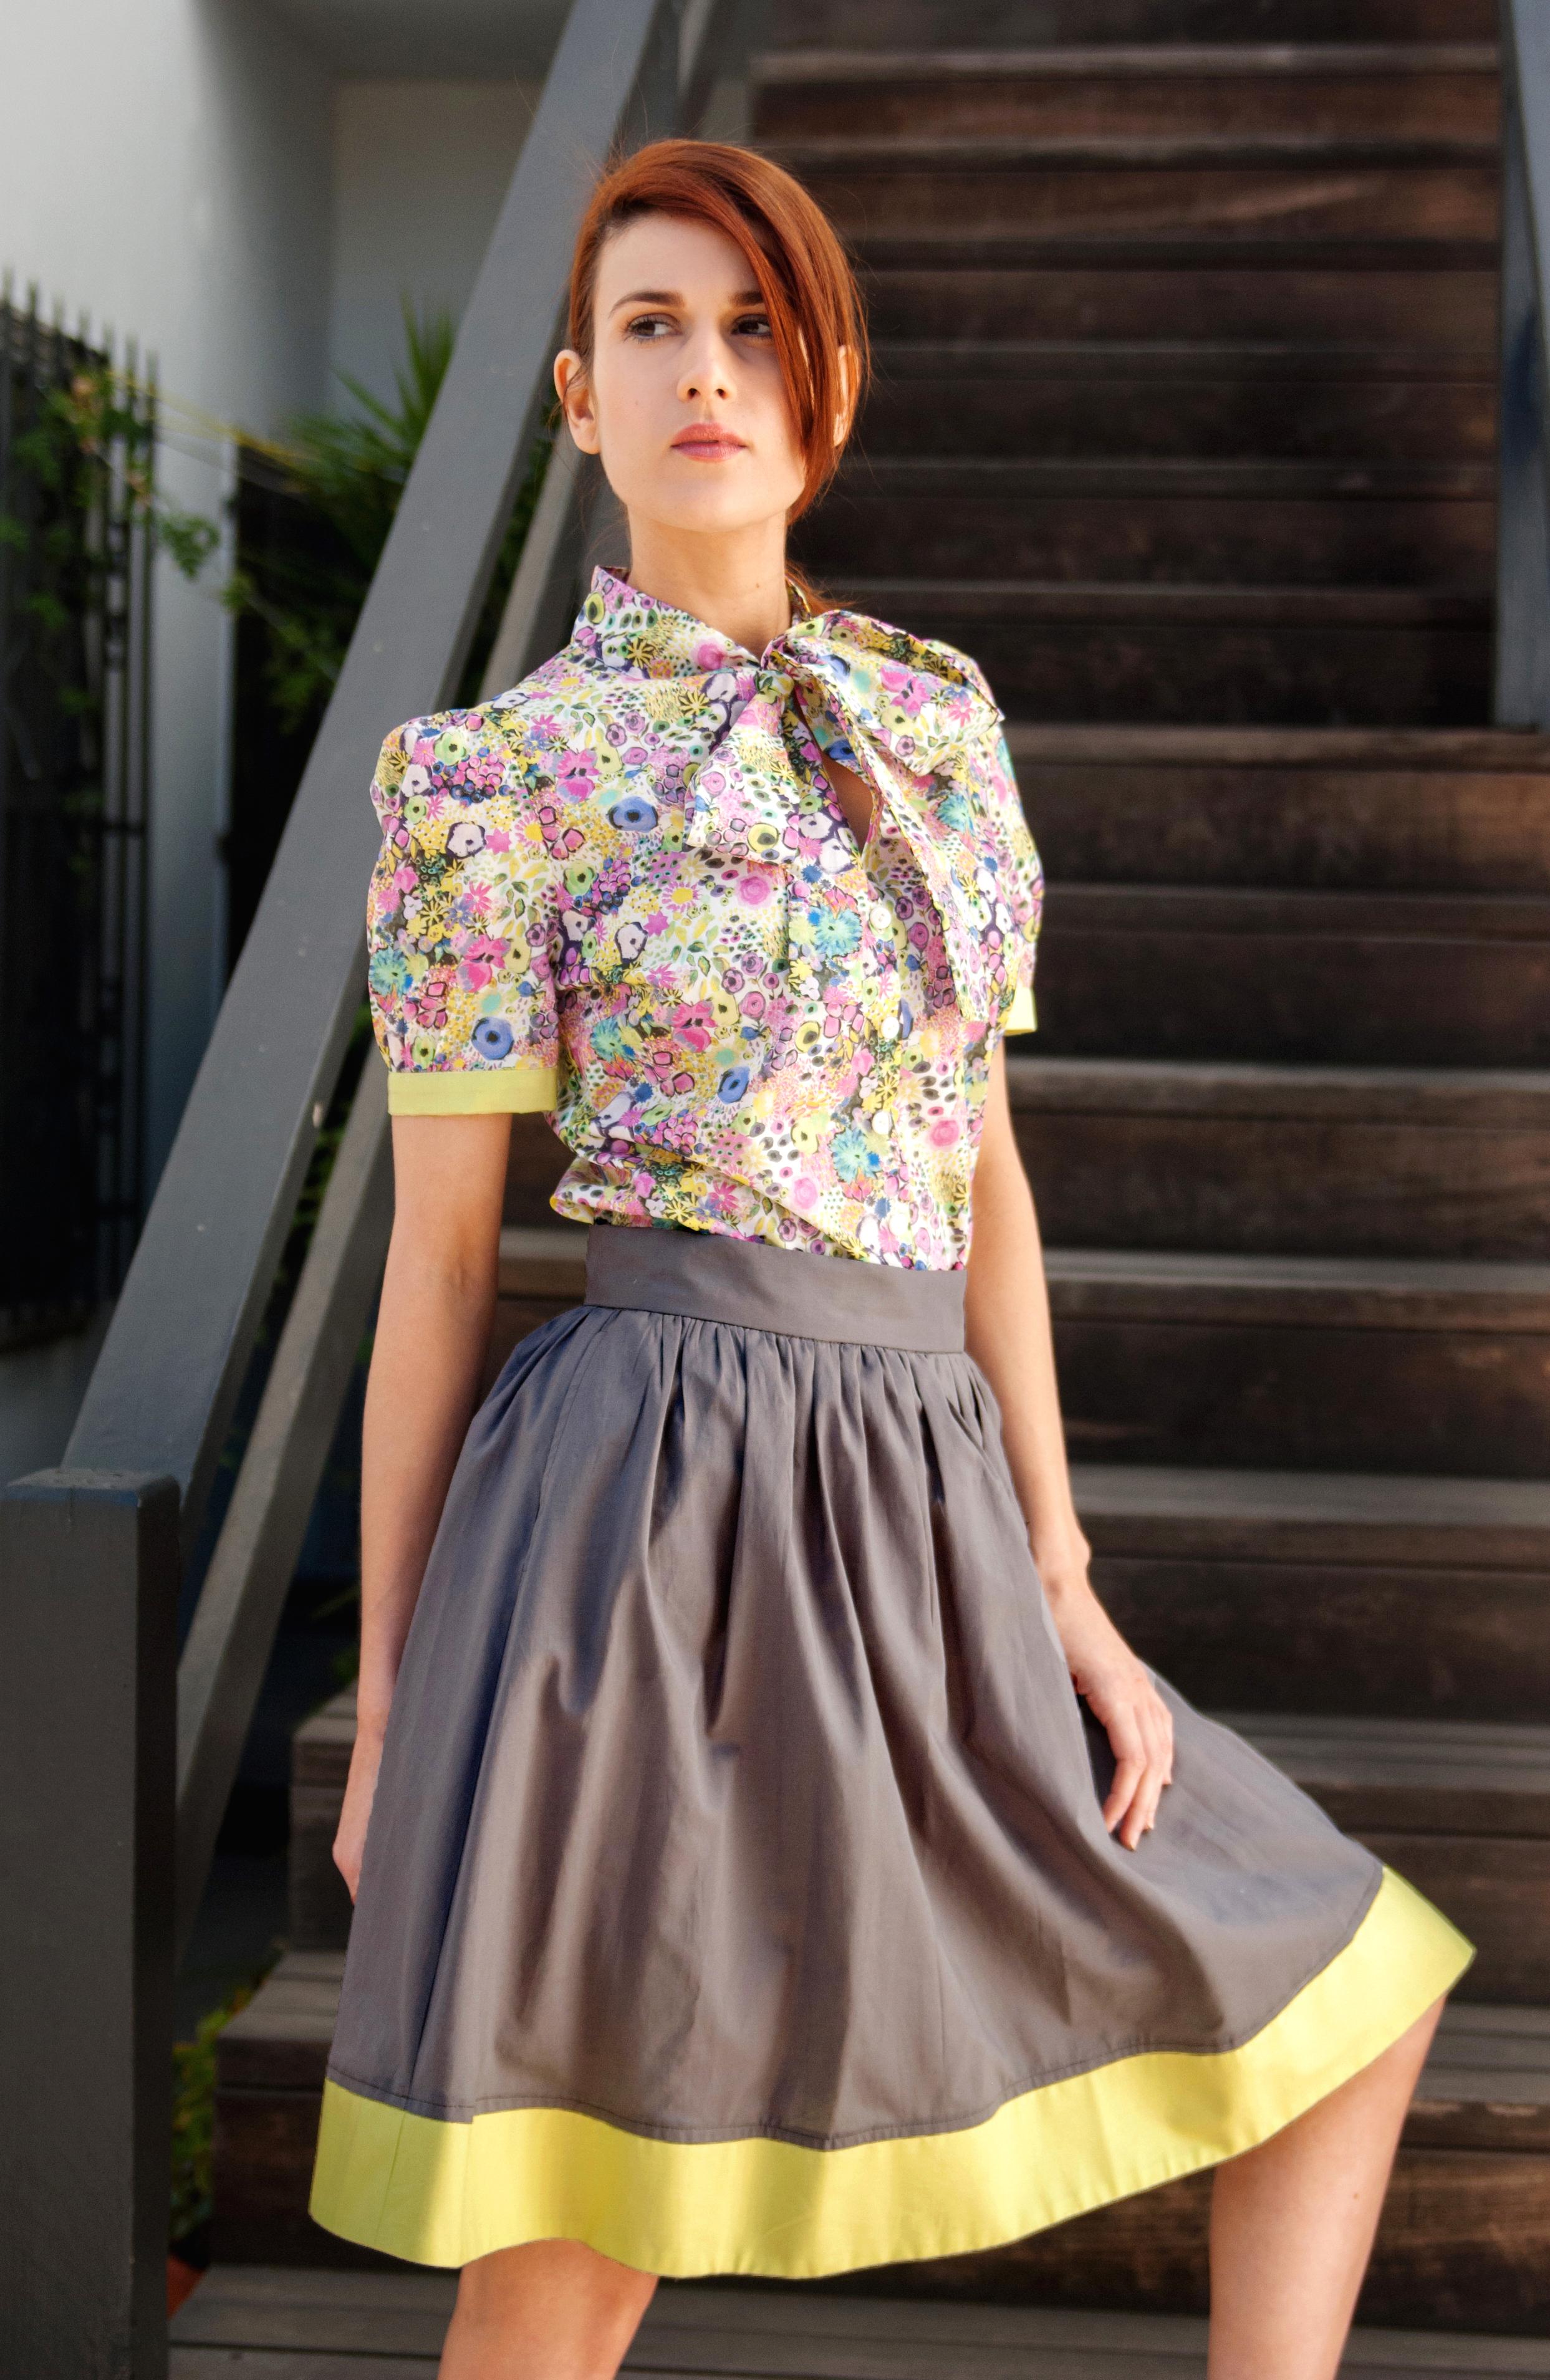 Bow Blouse in Liberty Print & Full Skirt